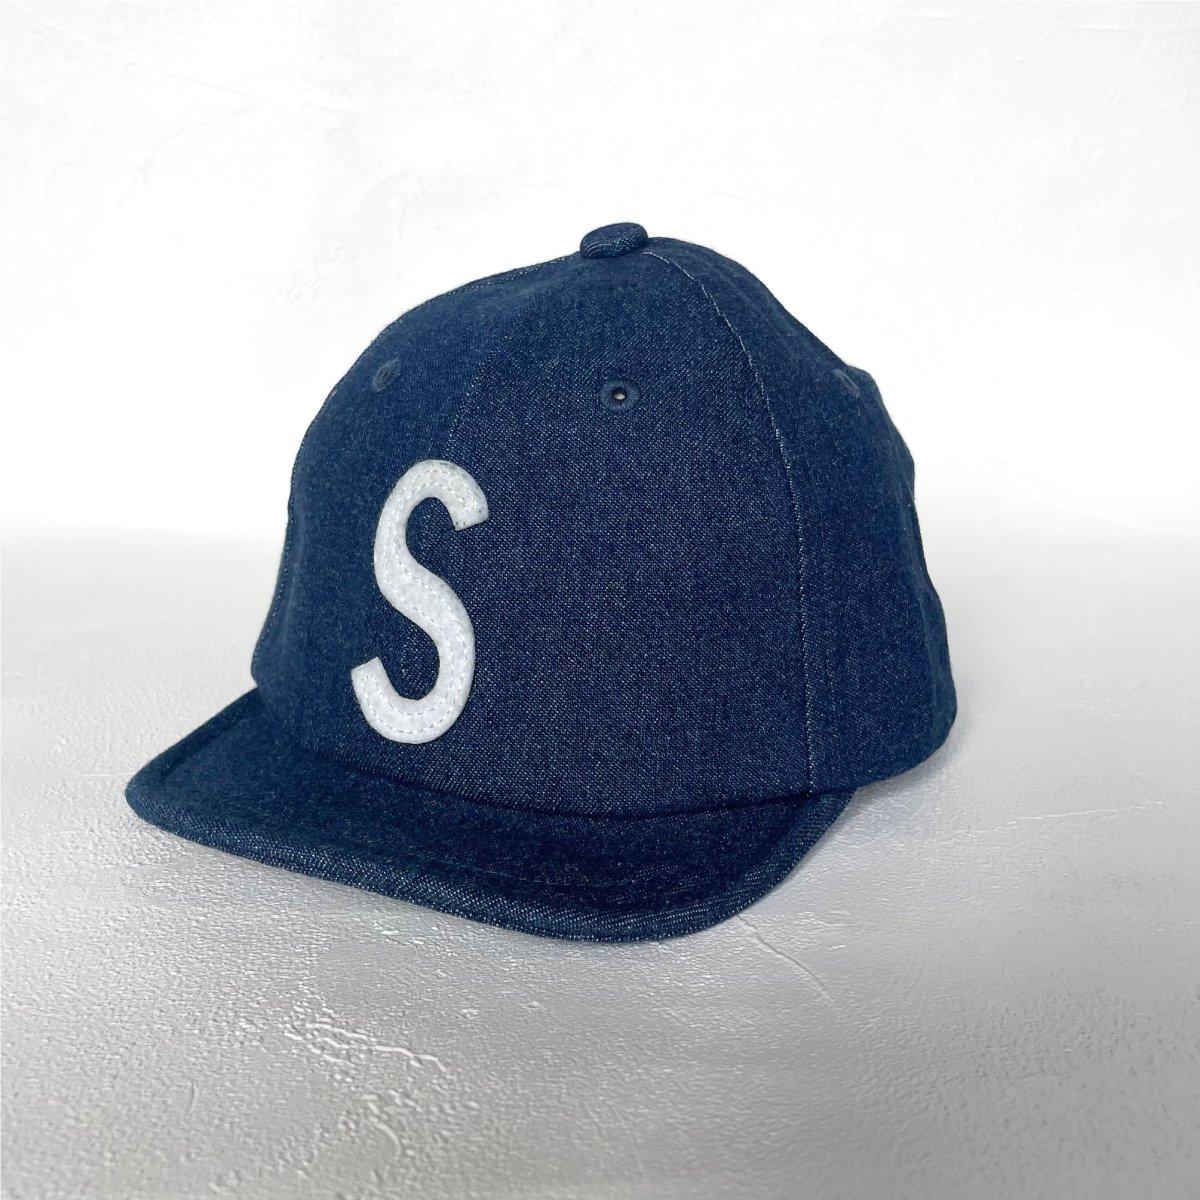 【BABY】Baby Sim Logo Cap 詳細画像5